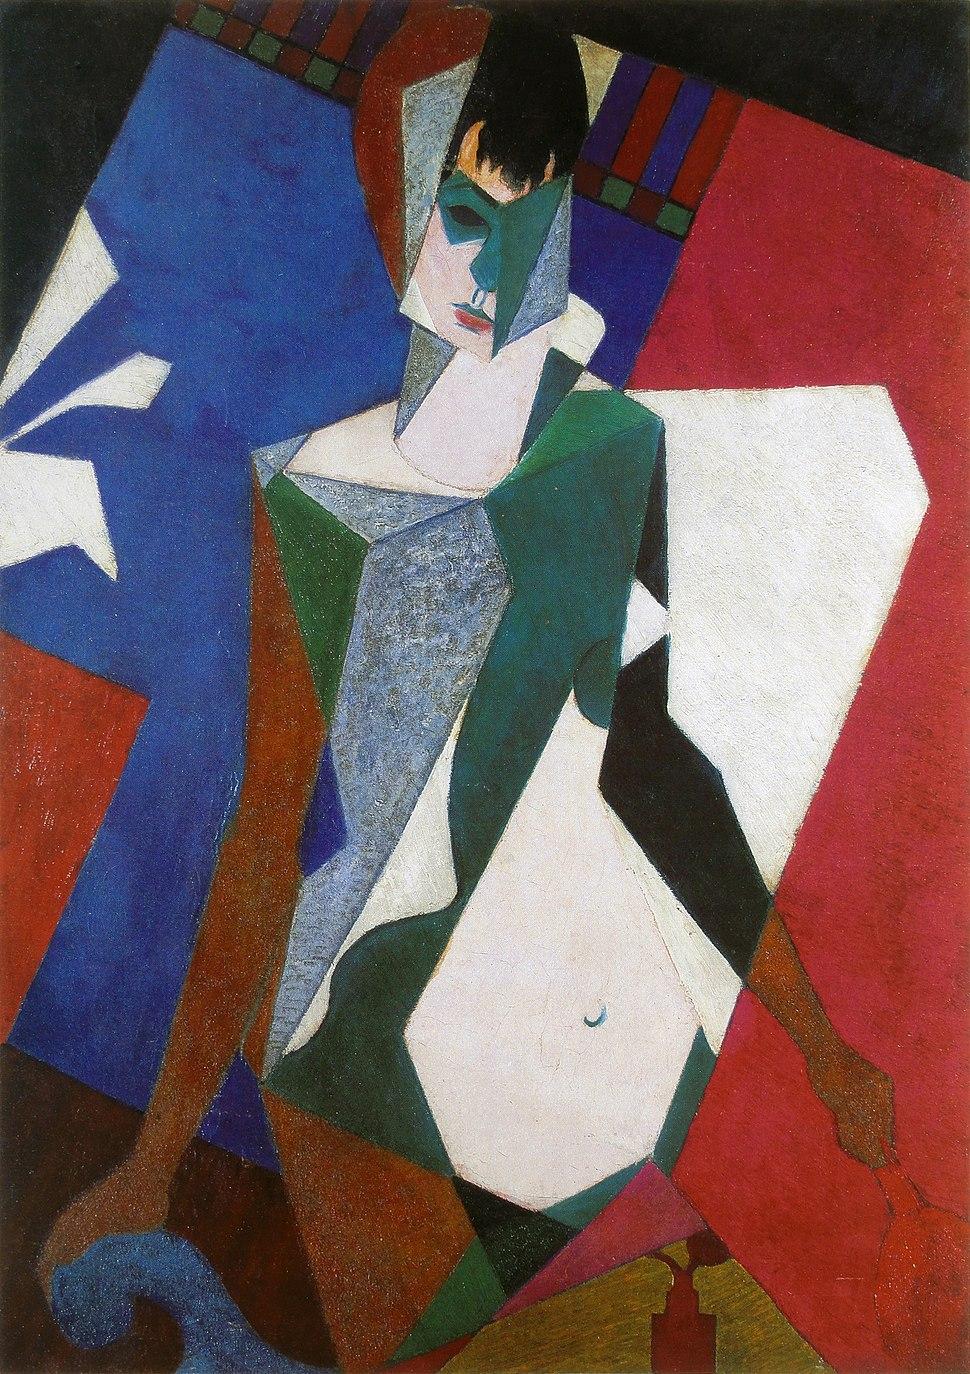 Jean Metzinger, 1916, Femme au miroir (Femme à sa toilette, Lady at her Dressing Table), oil on canvas, 92.4 x 65.1 cm, private collection